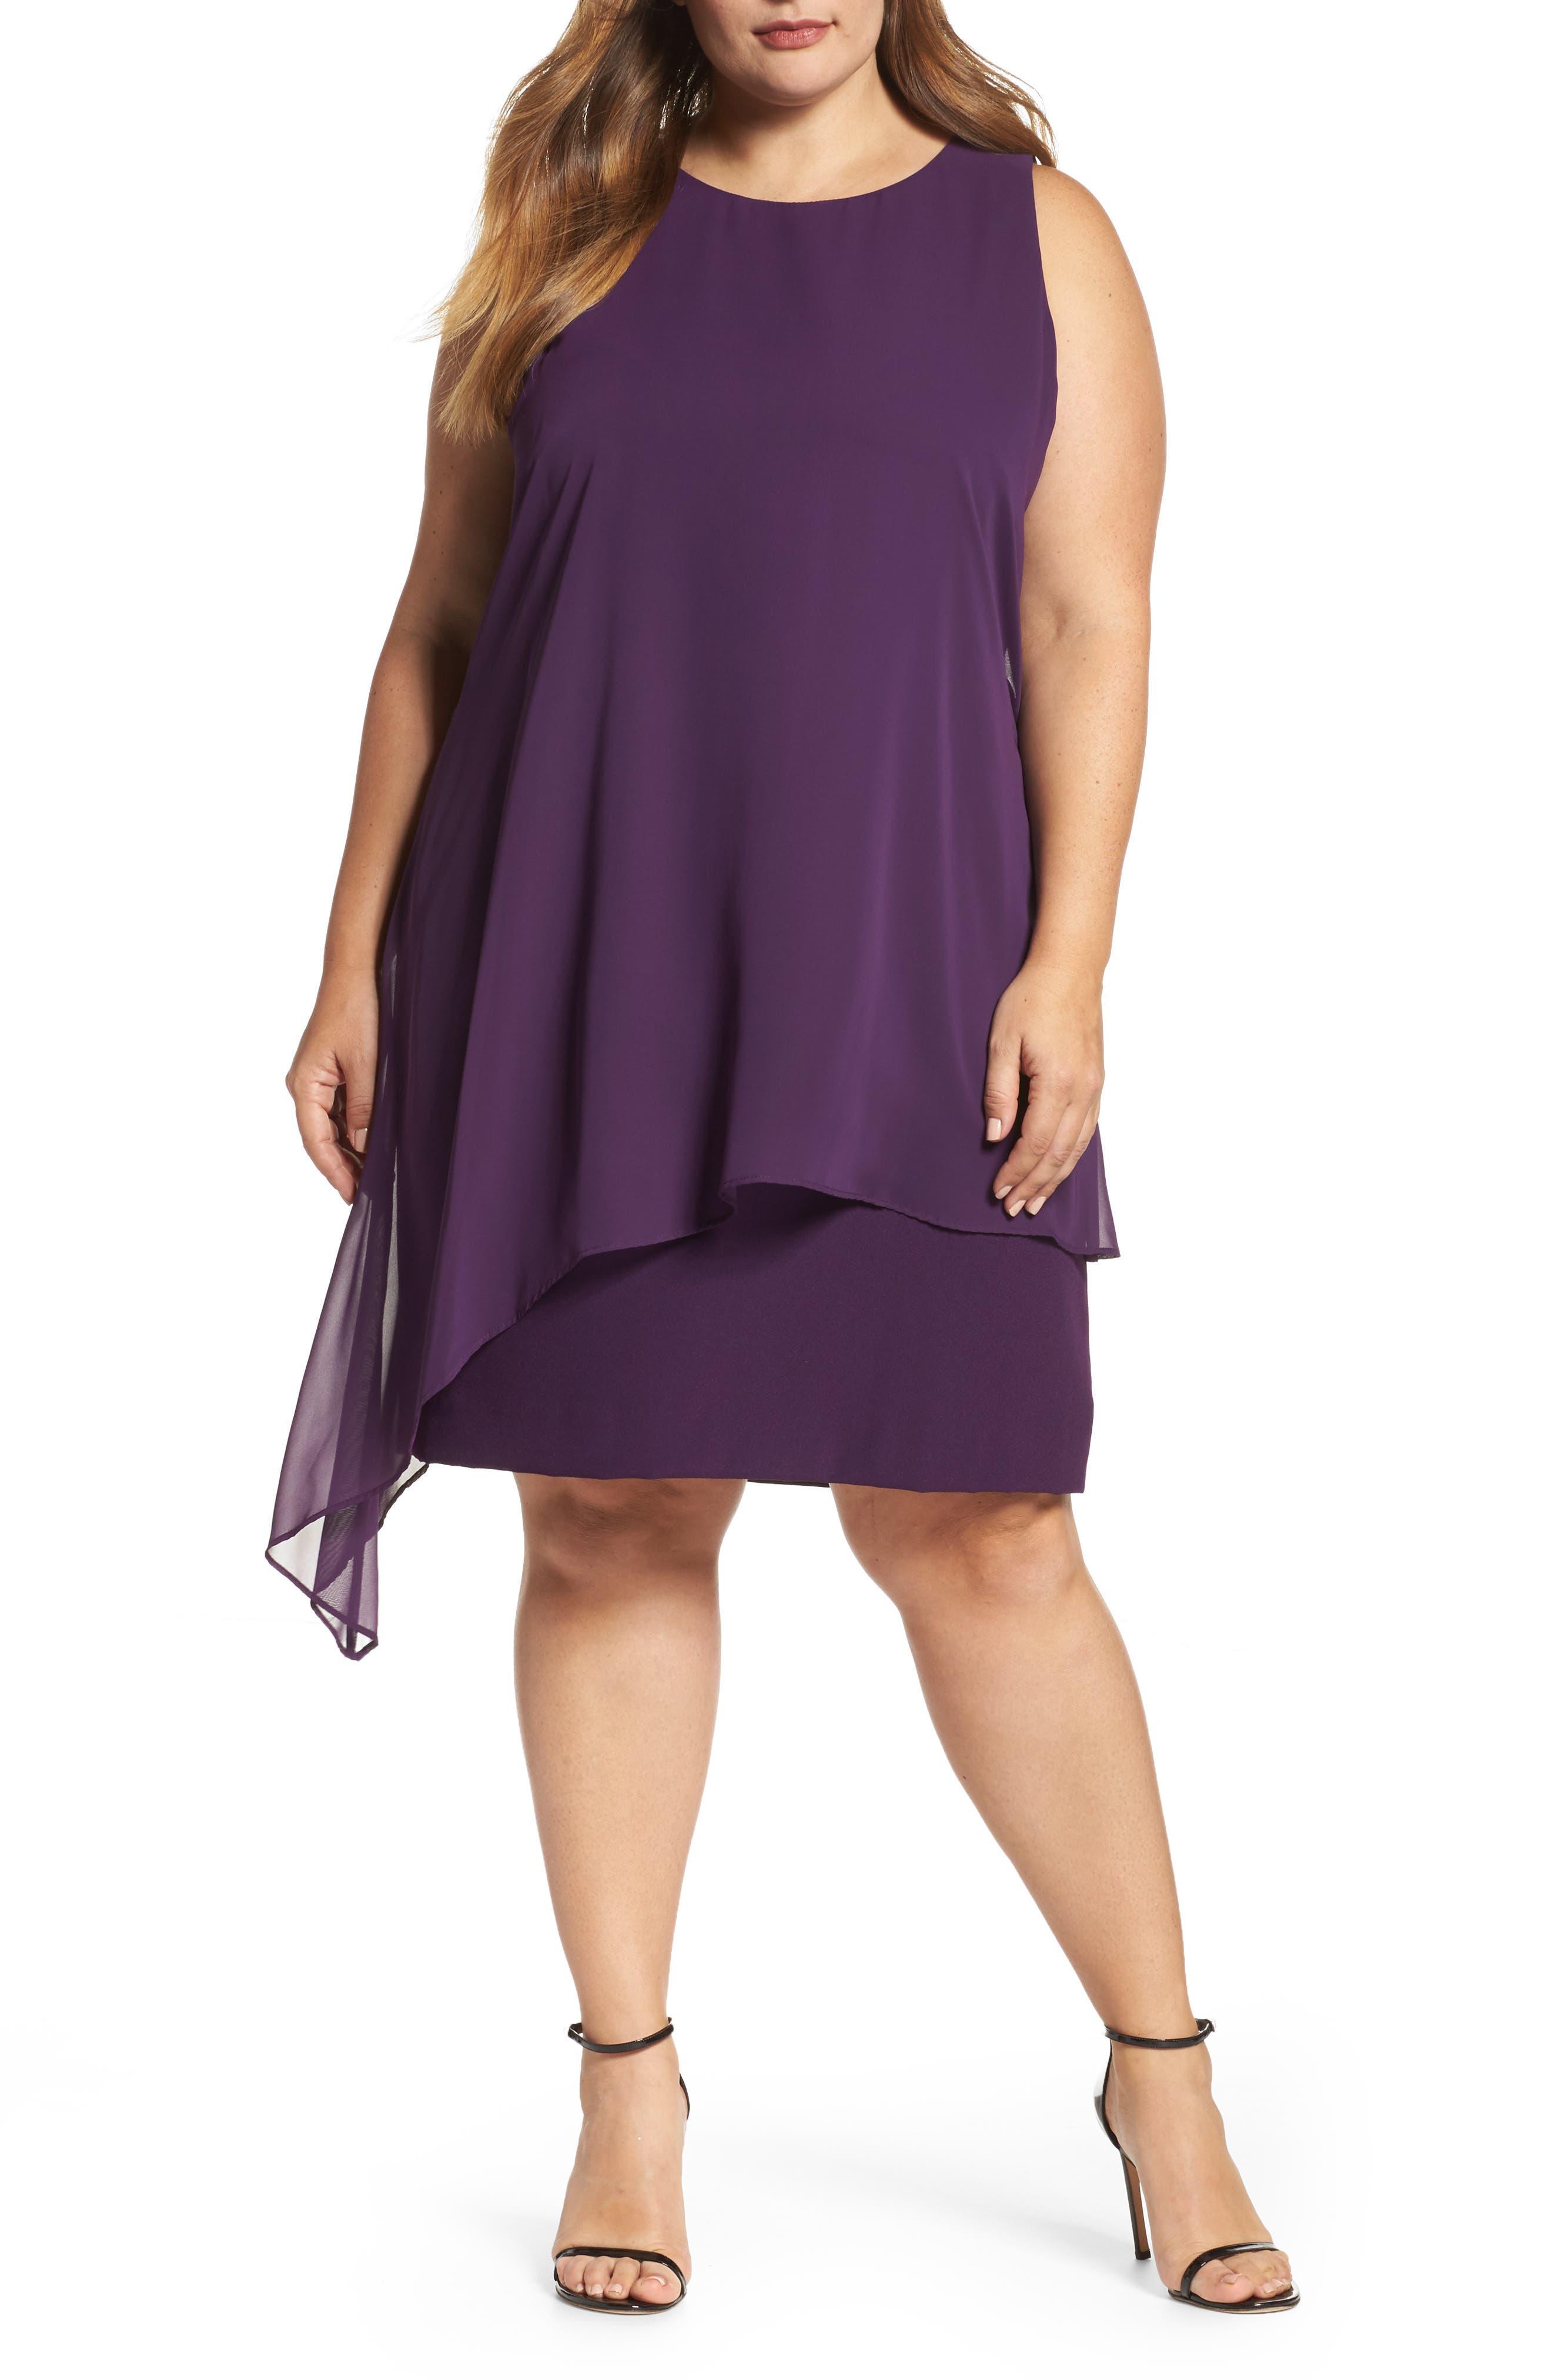 Tahari Chiffon Overlay Shift Dress (Plus Size)